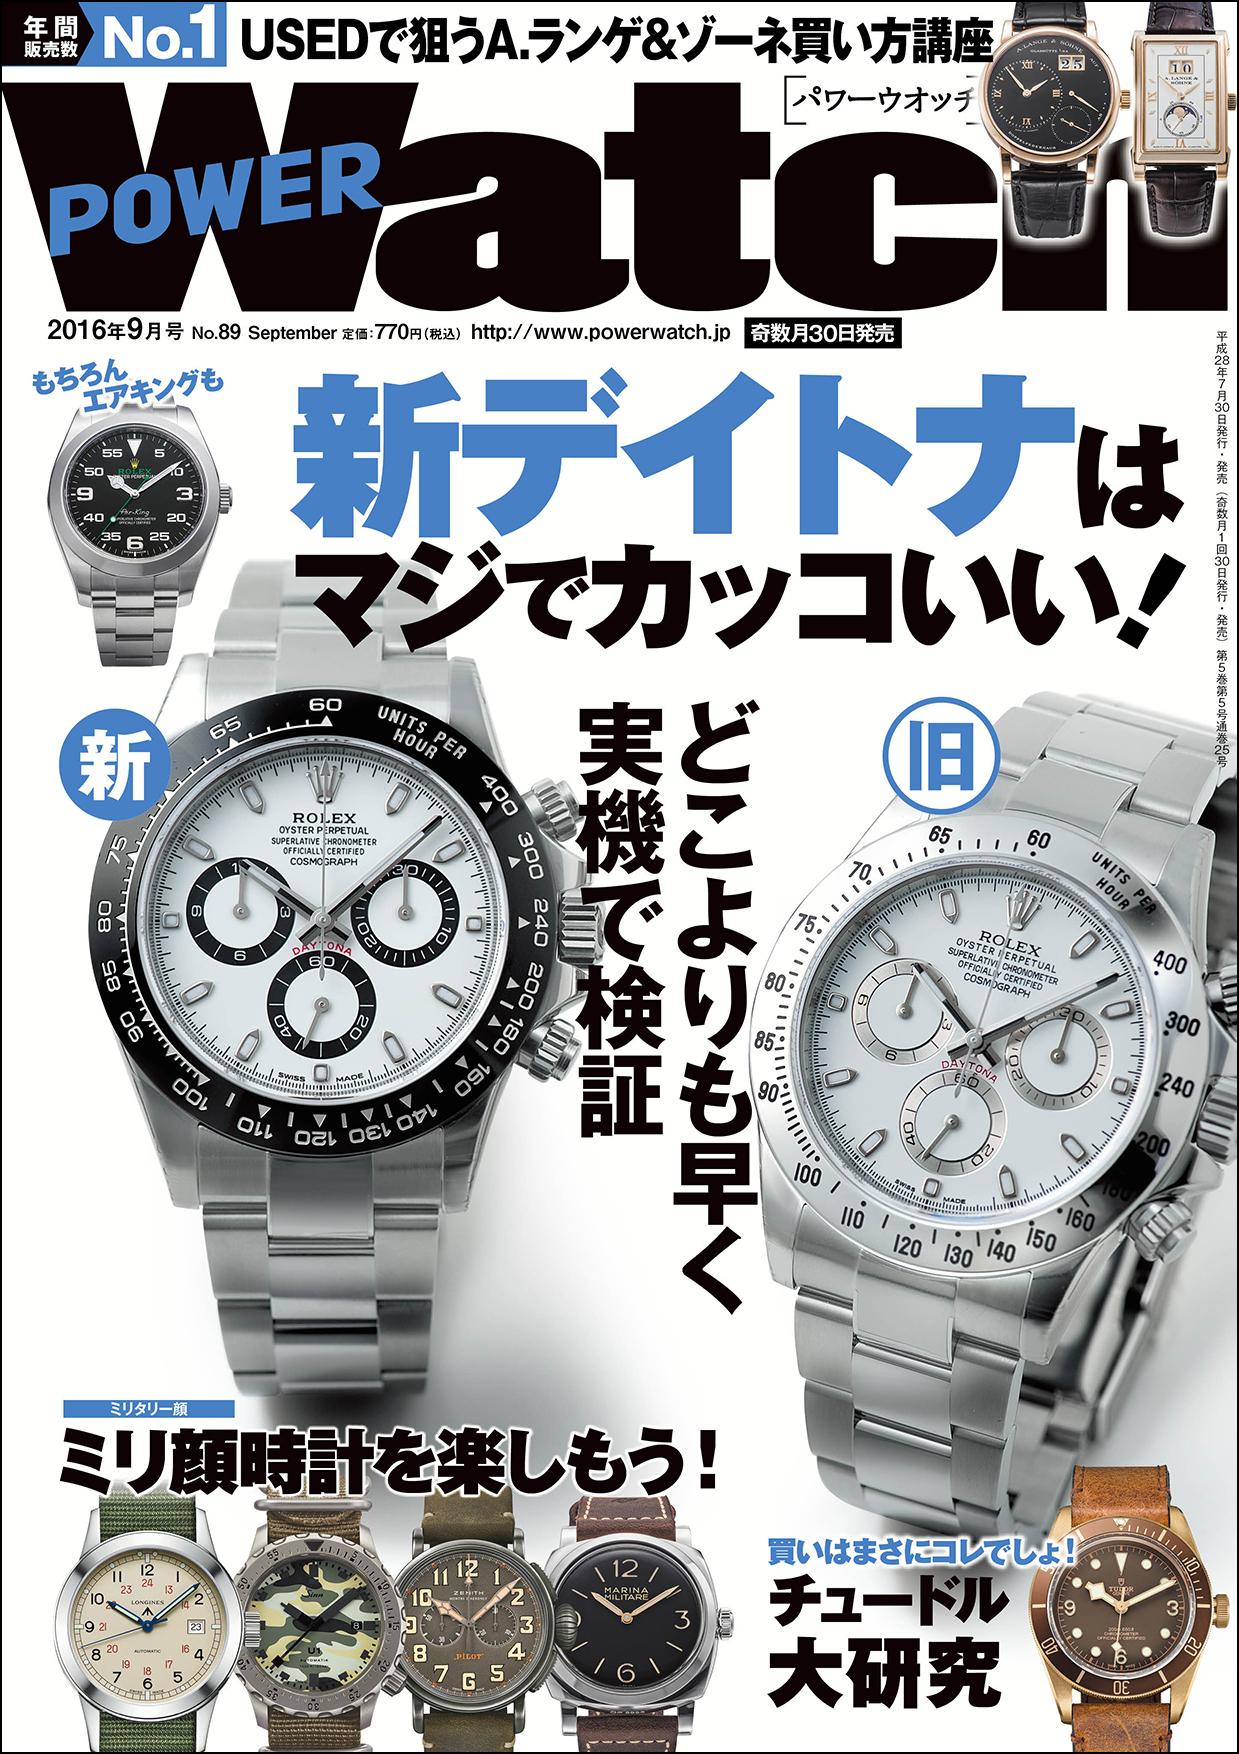 C's-Factory|書籍|PowerWATCH 9月号